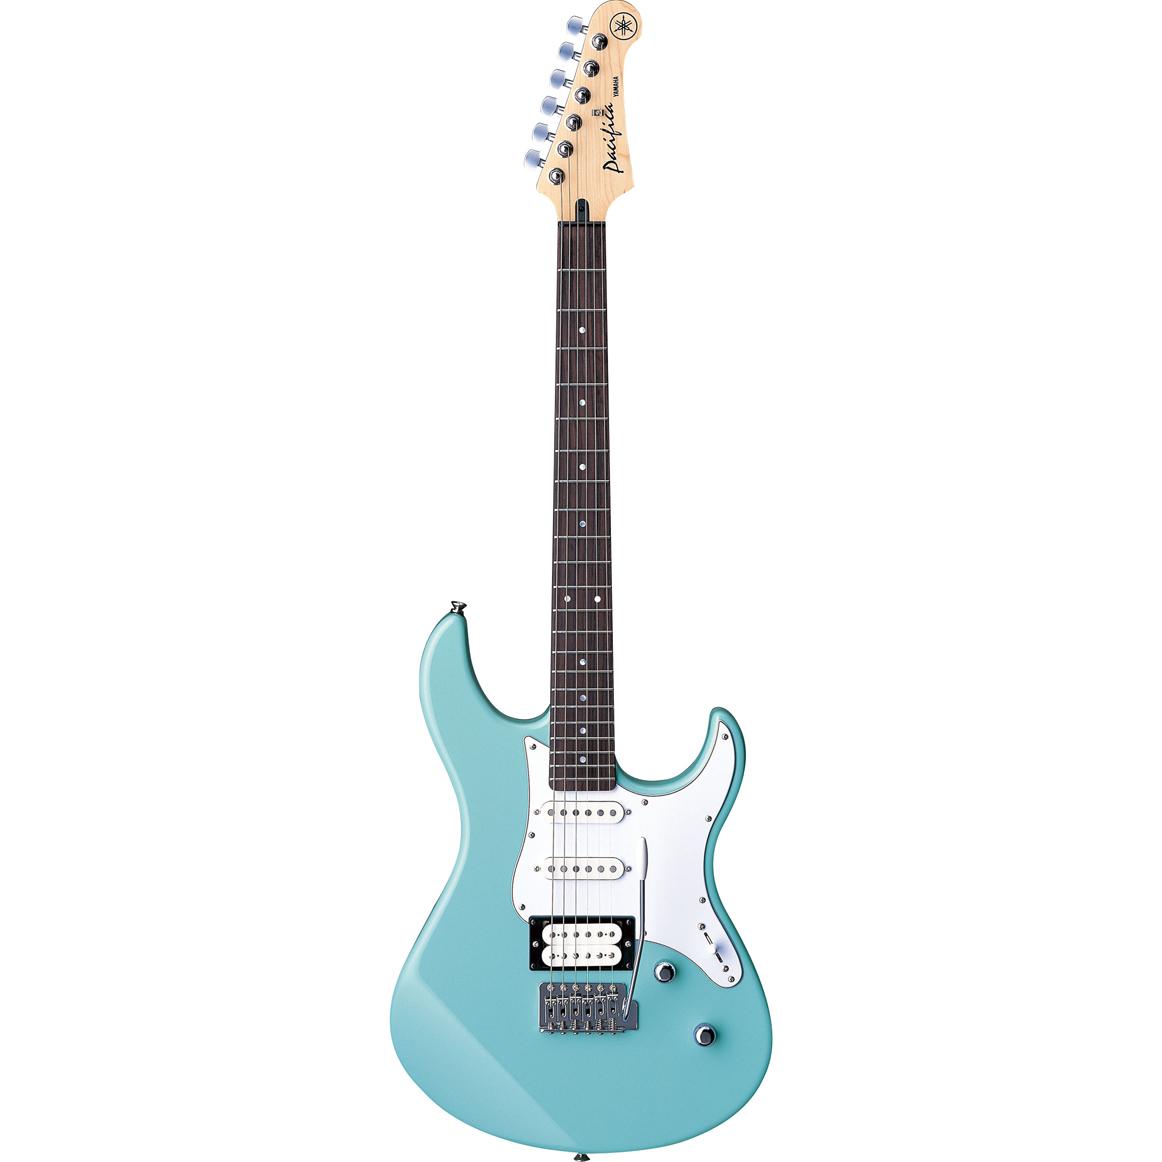 YAMAHA PACIFICA PAC112V SOB ソニックブルー ヤマハ エレキギター